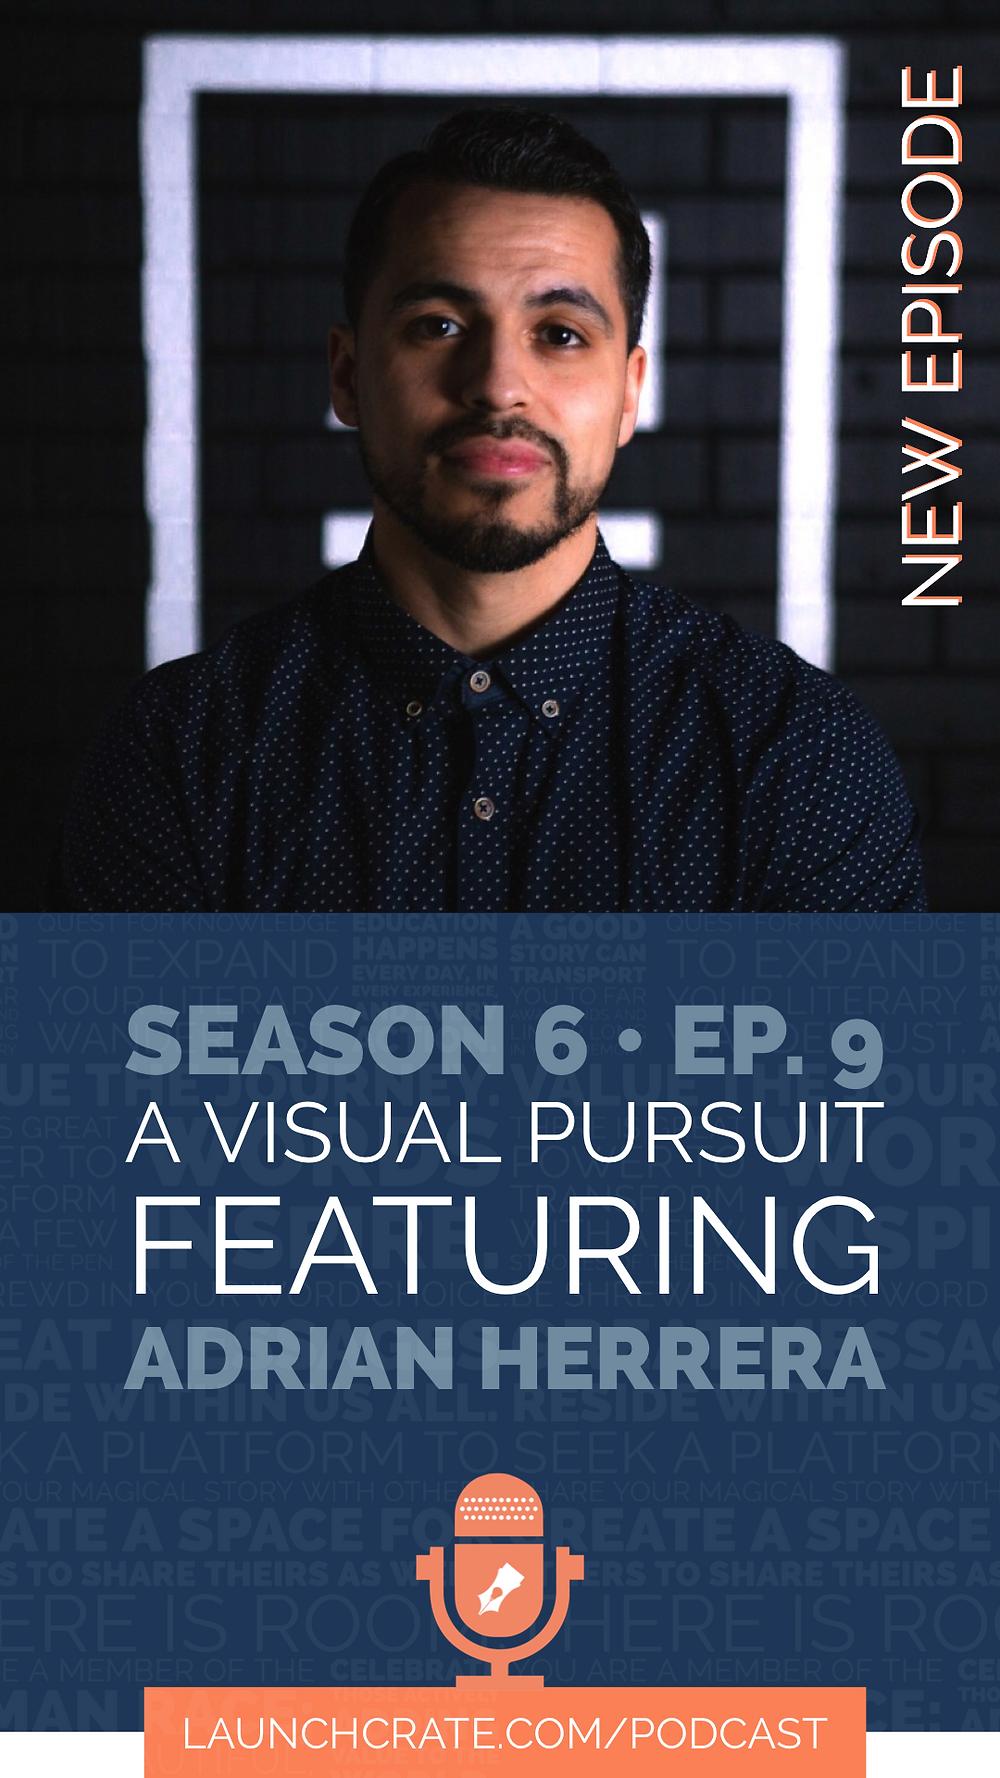 Podcast Season 6, Episode 9, with Adrian Herrera